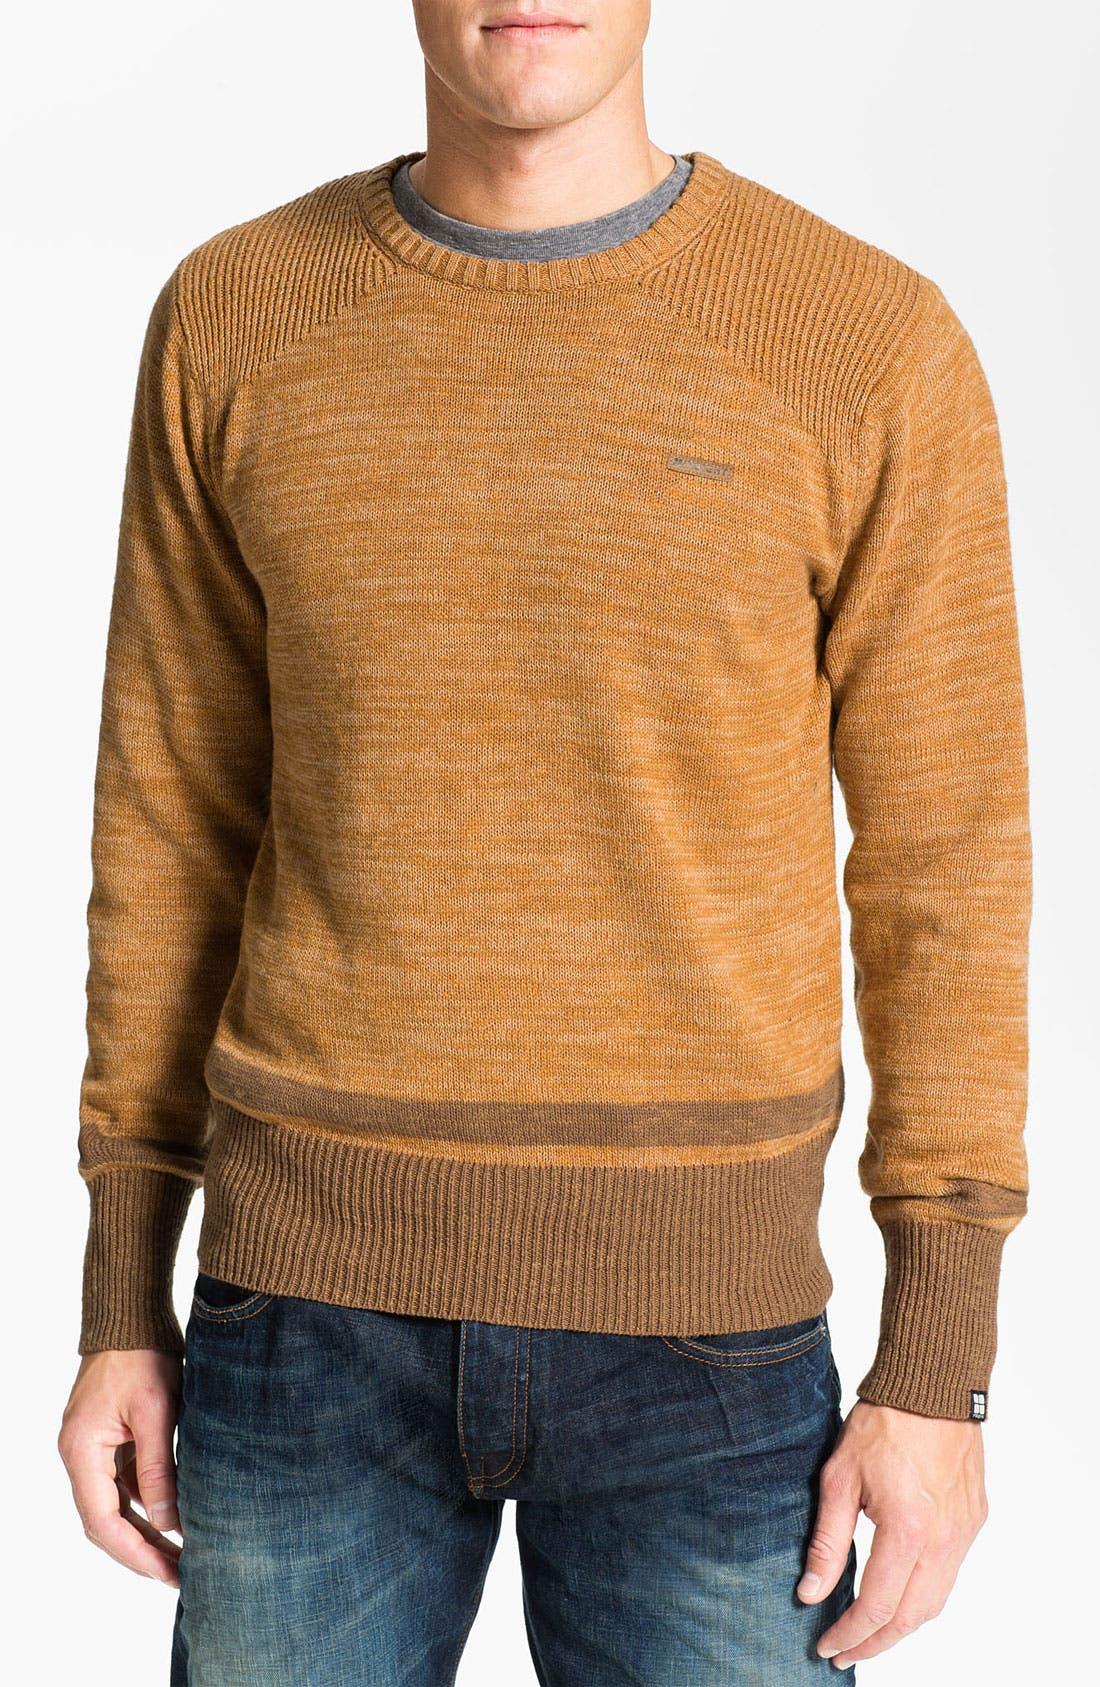 Alternate Image 1 Selected - Insight 'The Meek' Crewneck Sweater